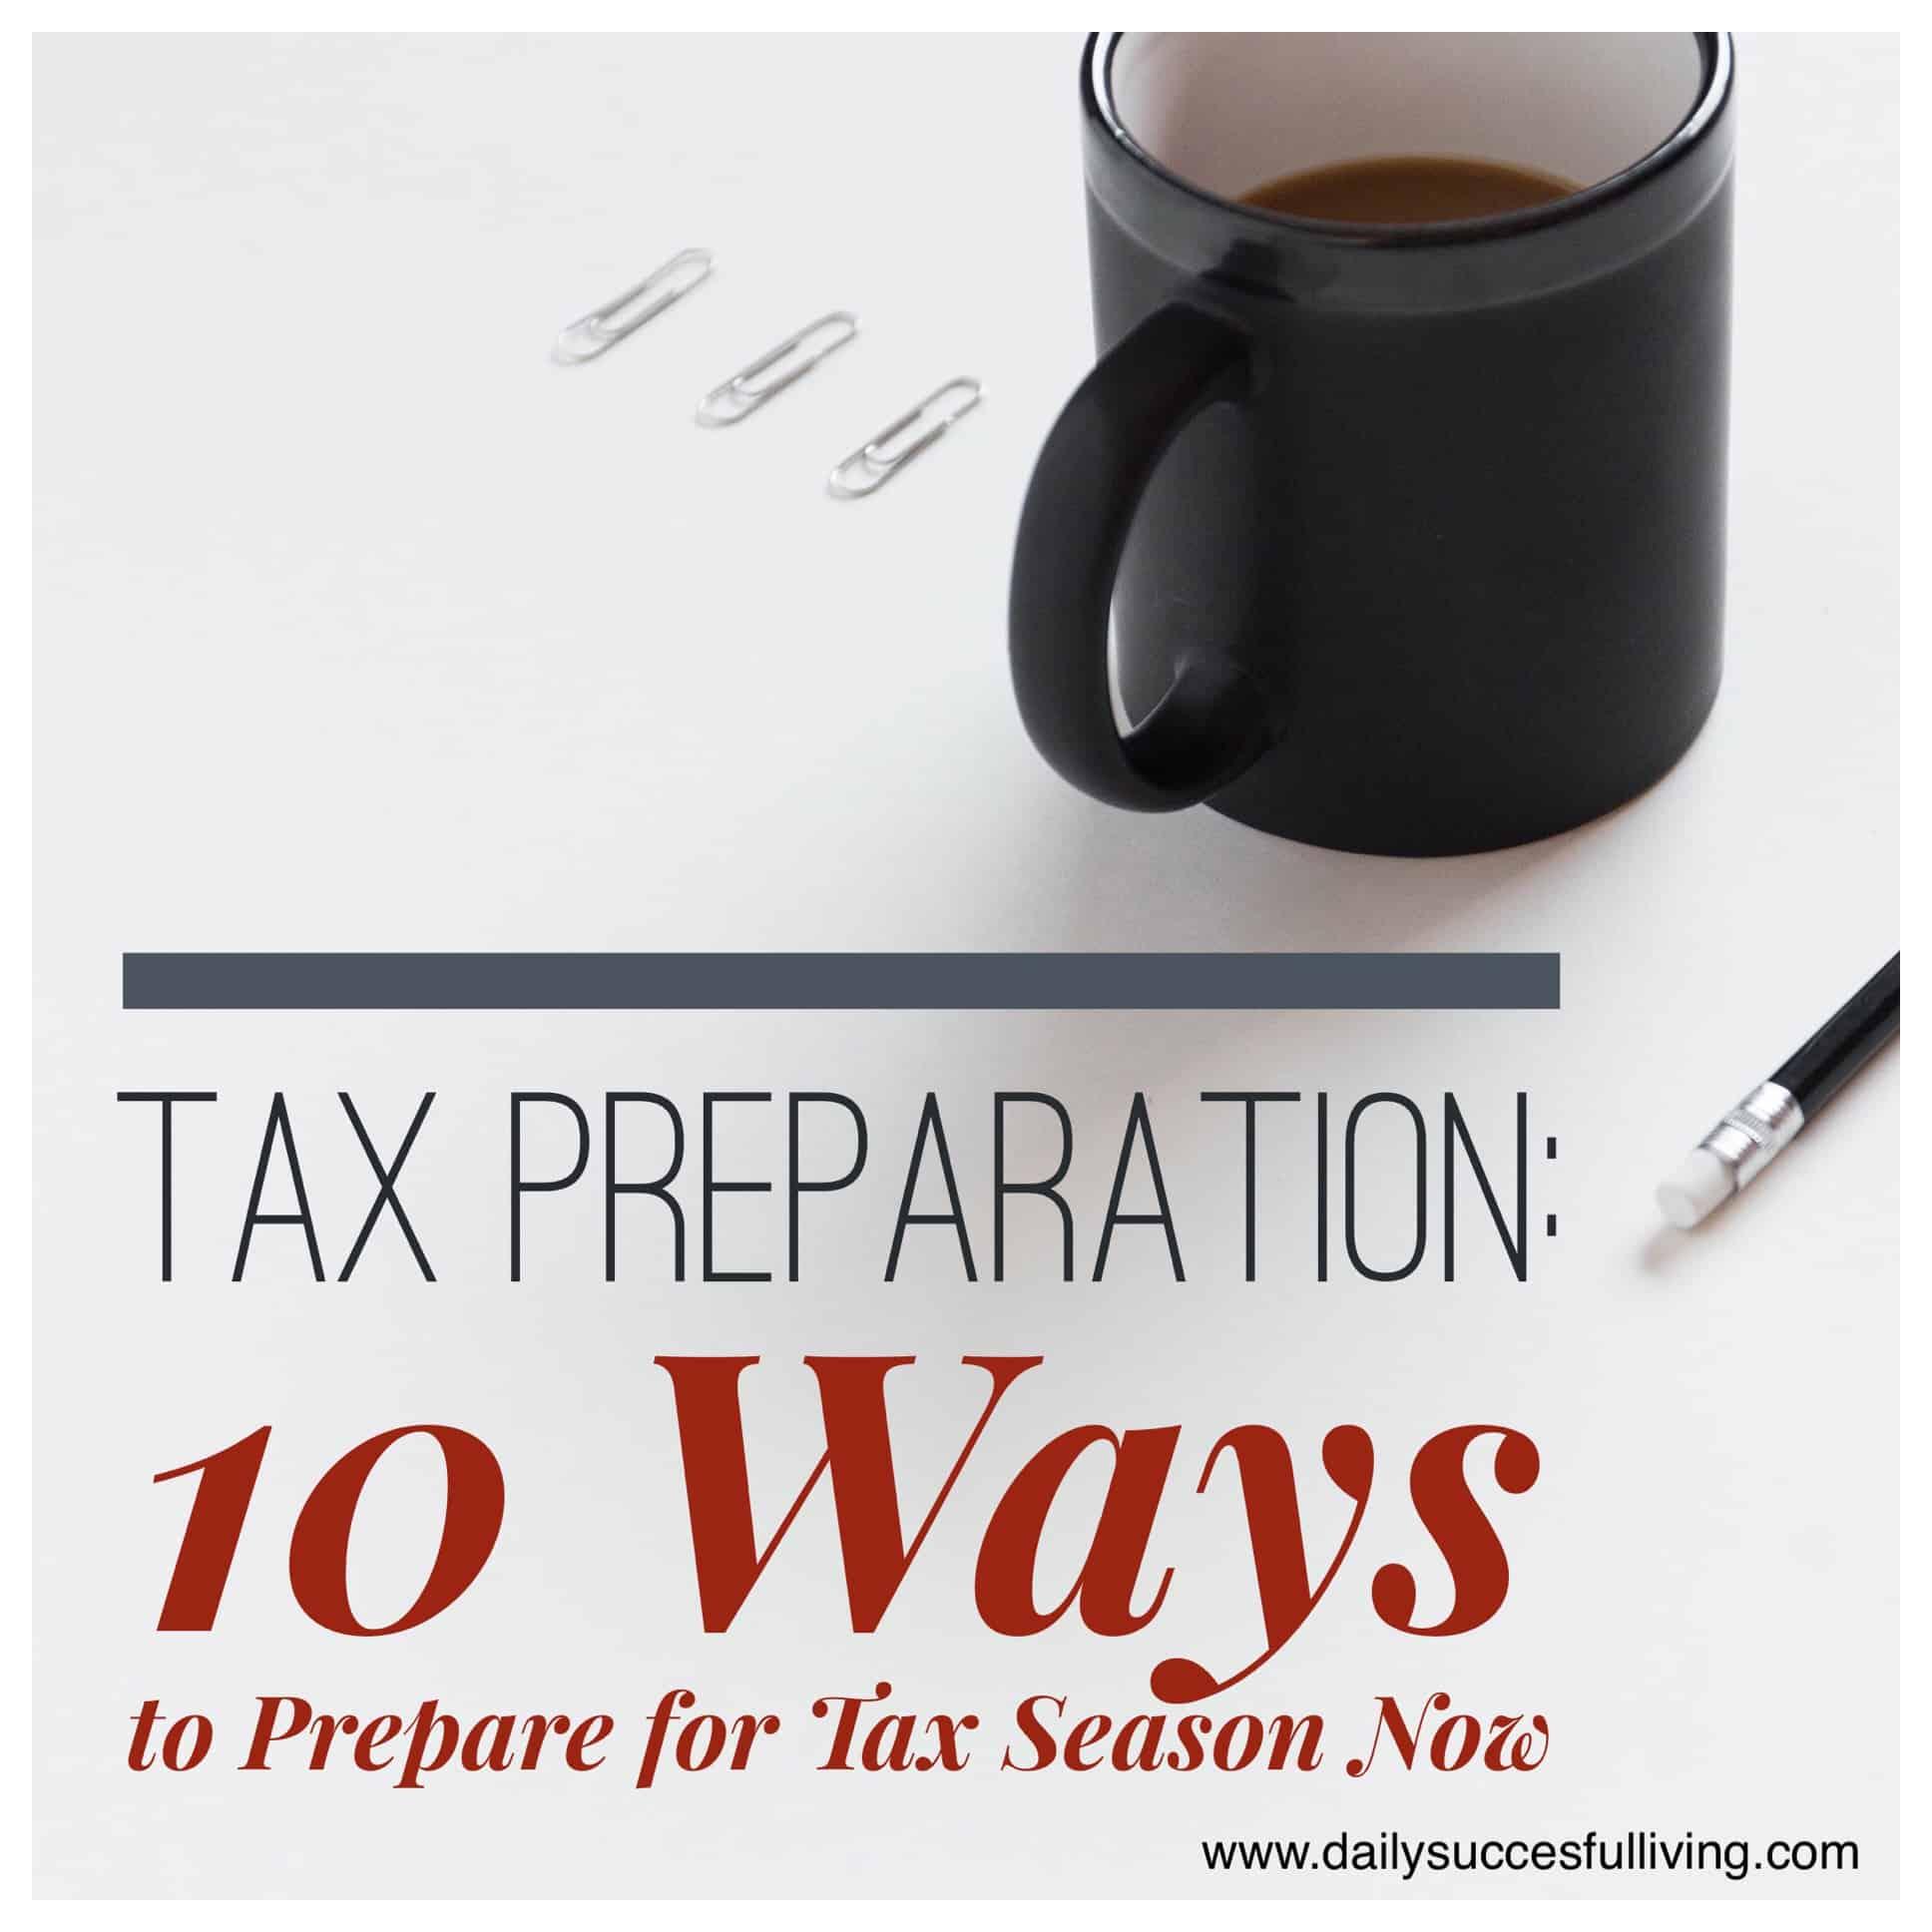 Tax Preparation 10 Ways To Prepare For Tax Season Now